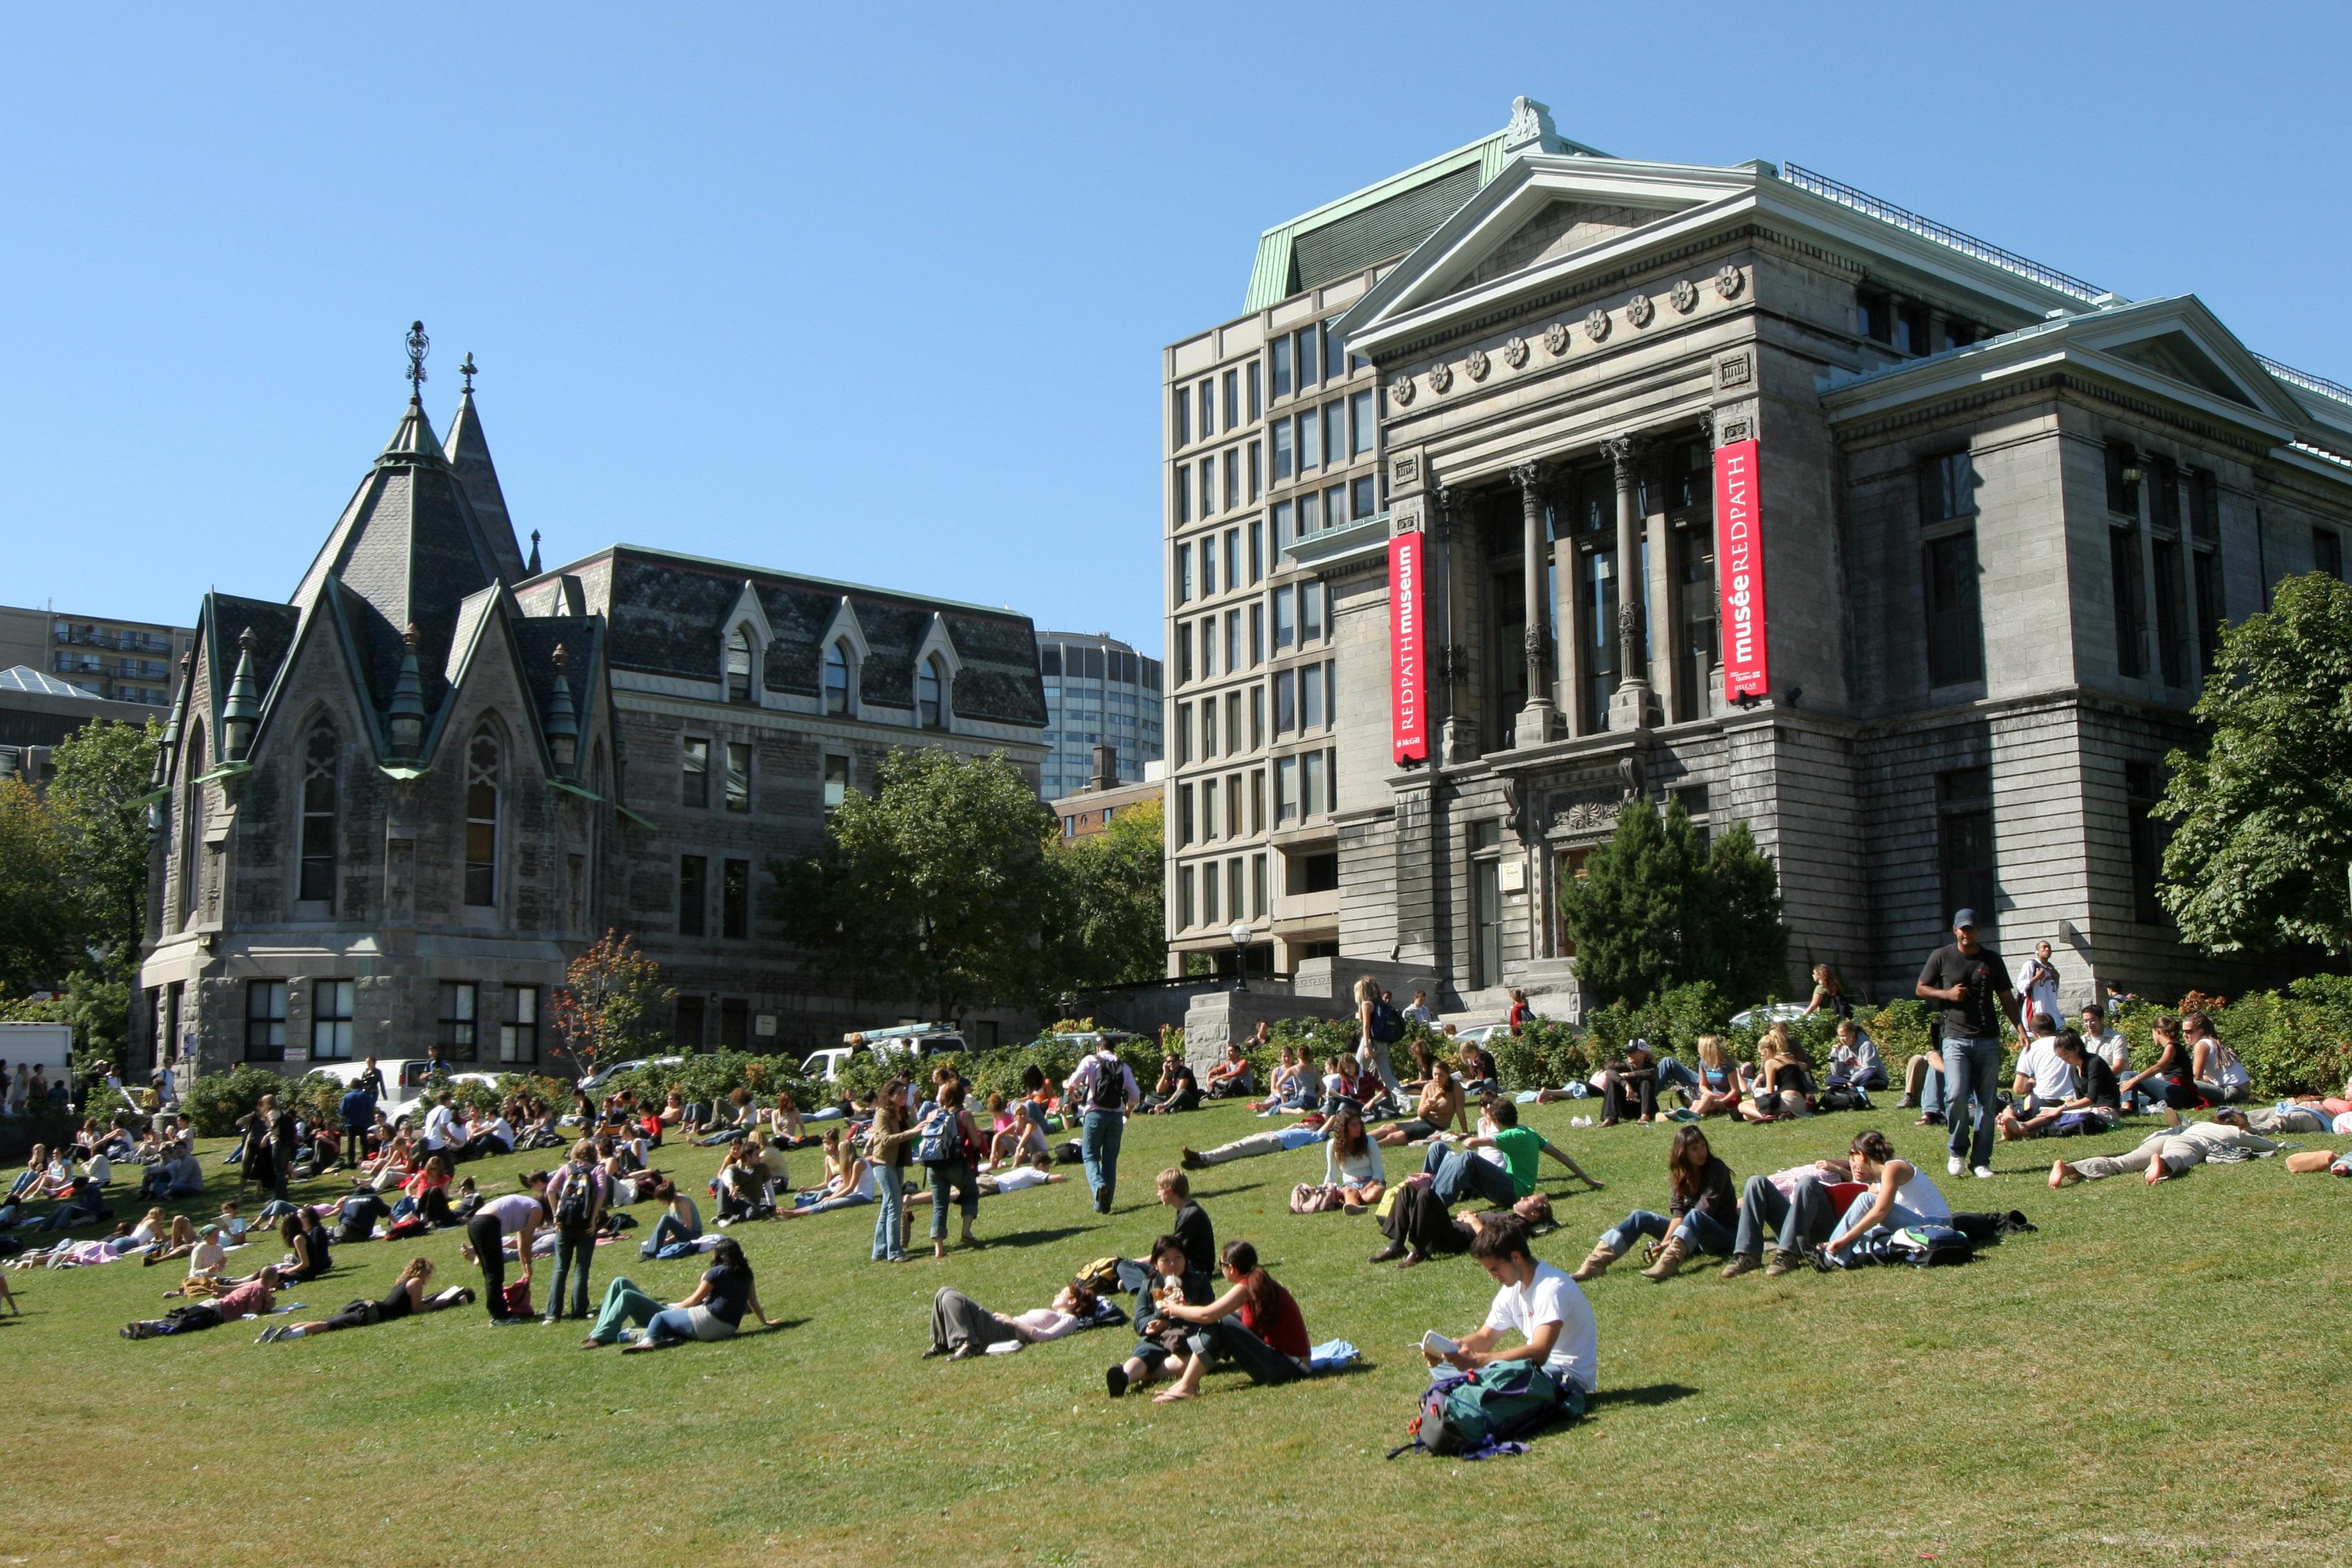 du học Canada tại đại học McGill